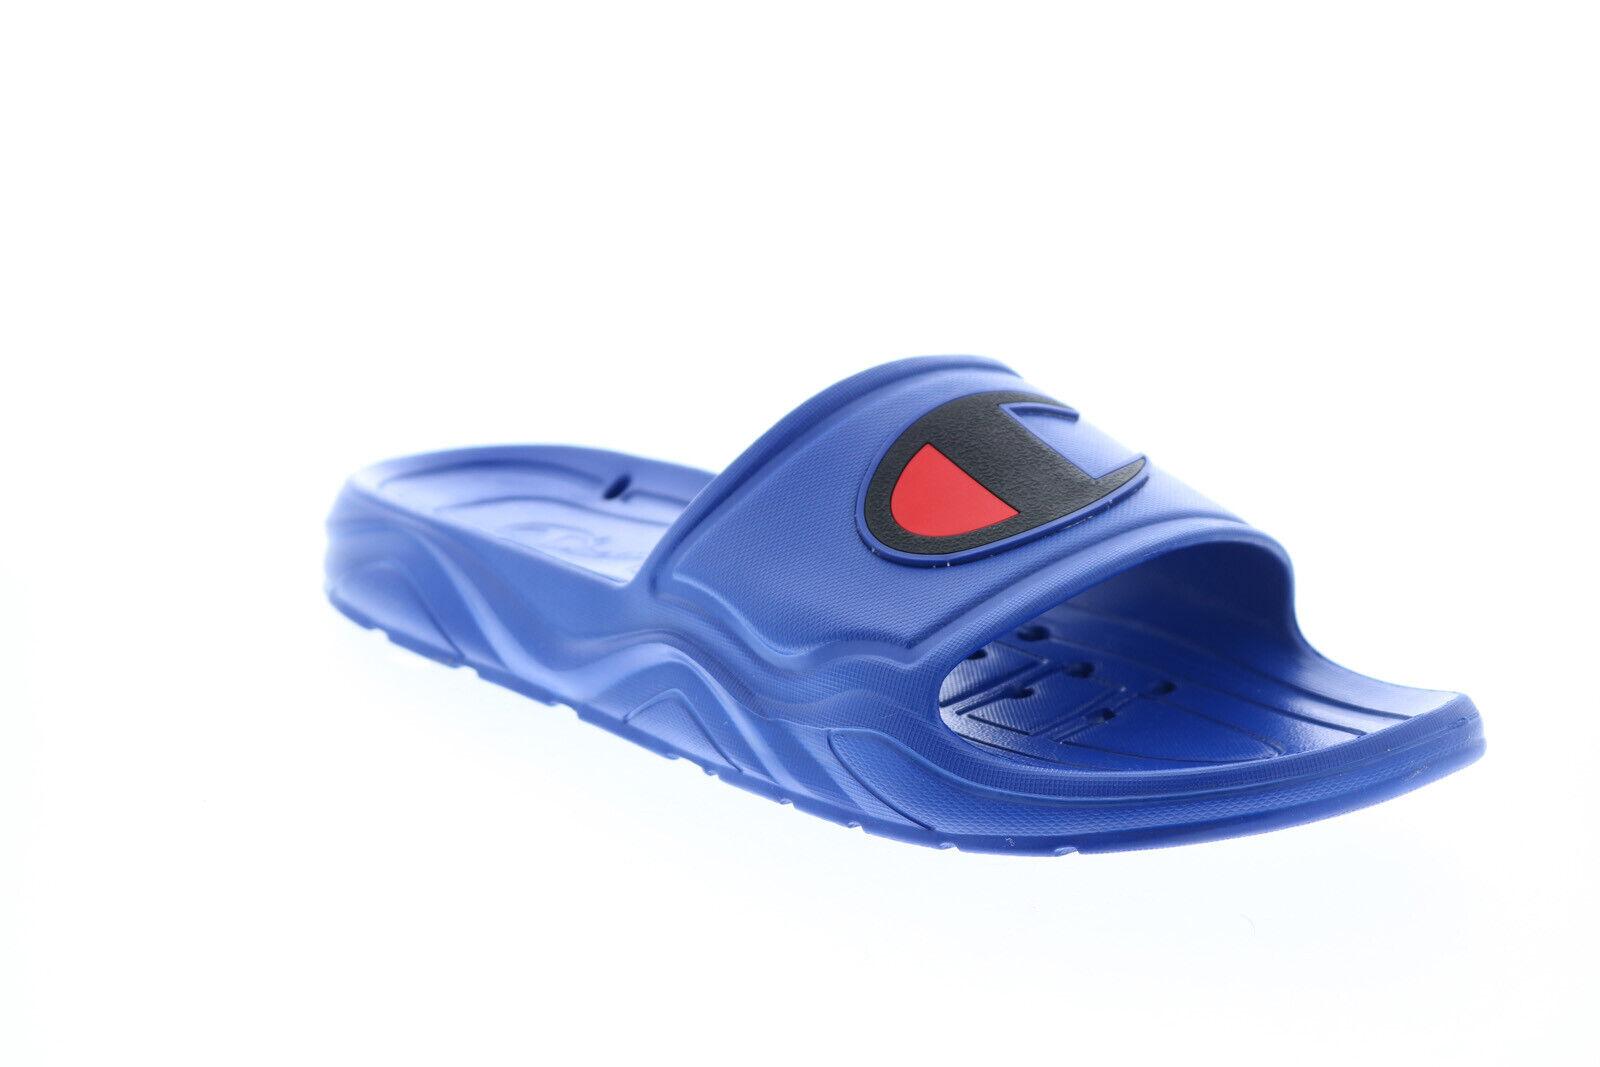 Champion Hydro-C CP101063M Mens Blue Synthetic Sandals Slides Shoes